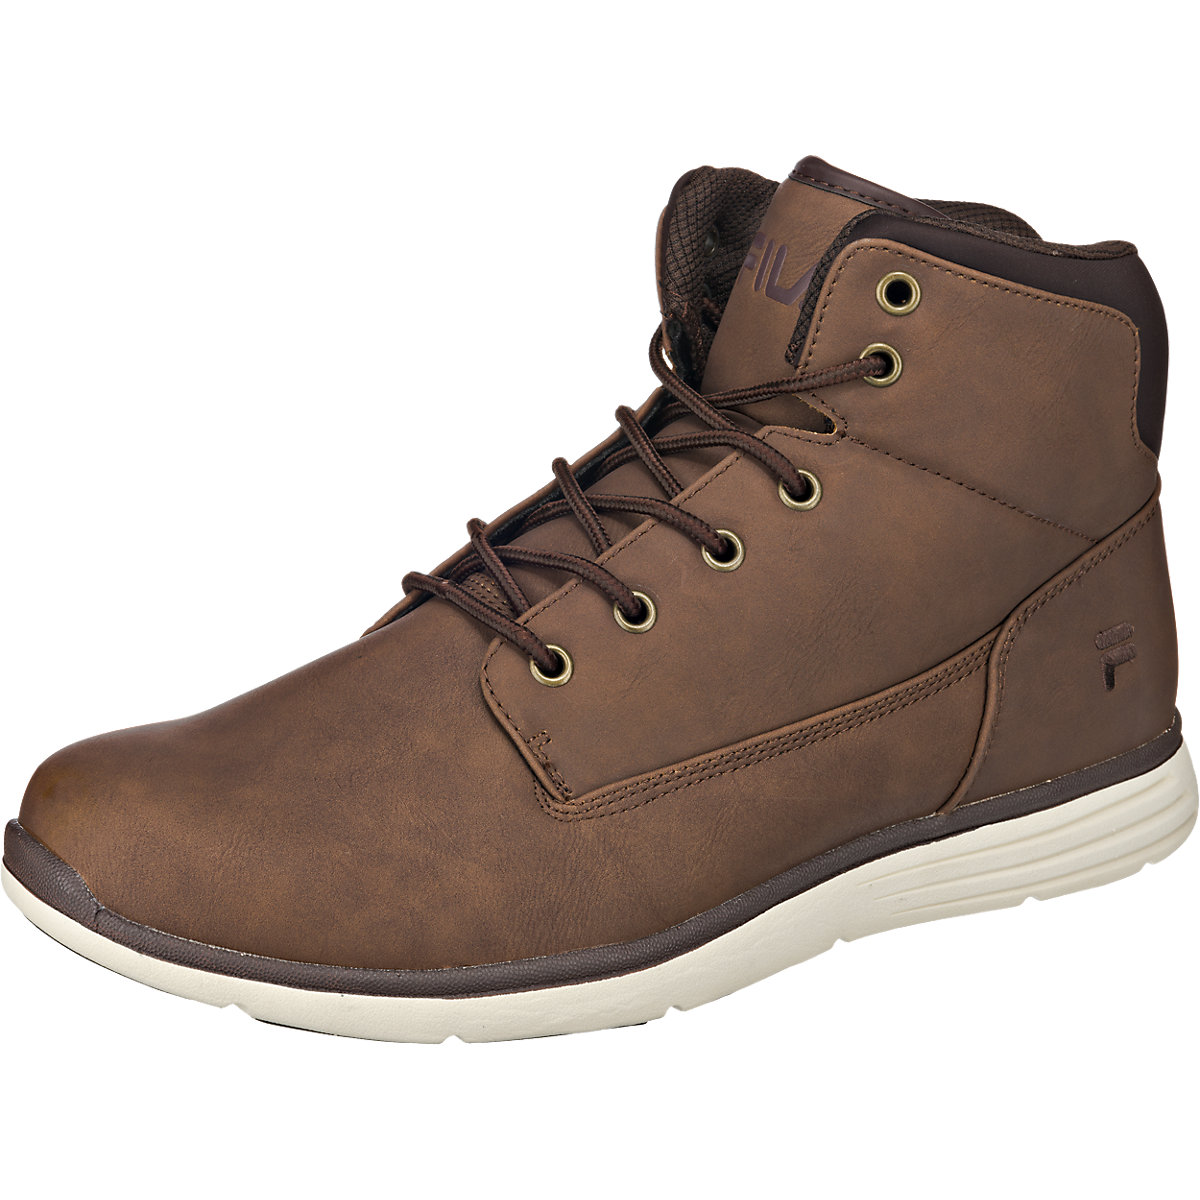 Fila Sport Lance Men Mid 1010146Classic Bruin Shoes 7ybfgY6v